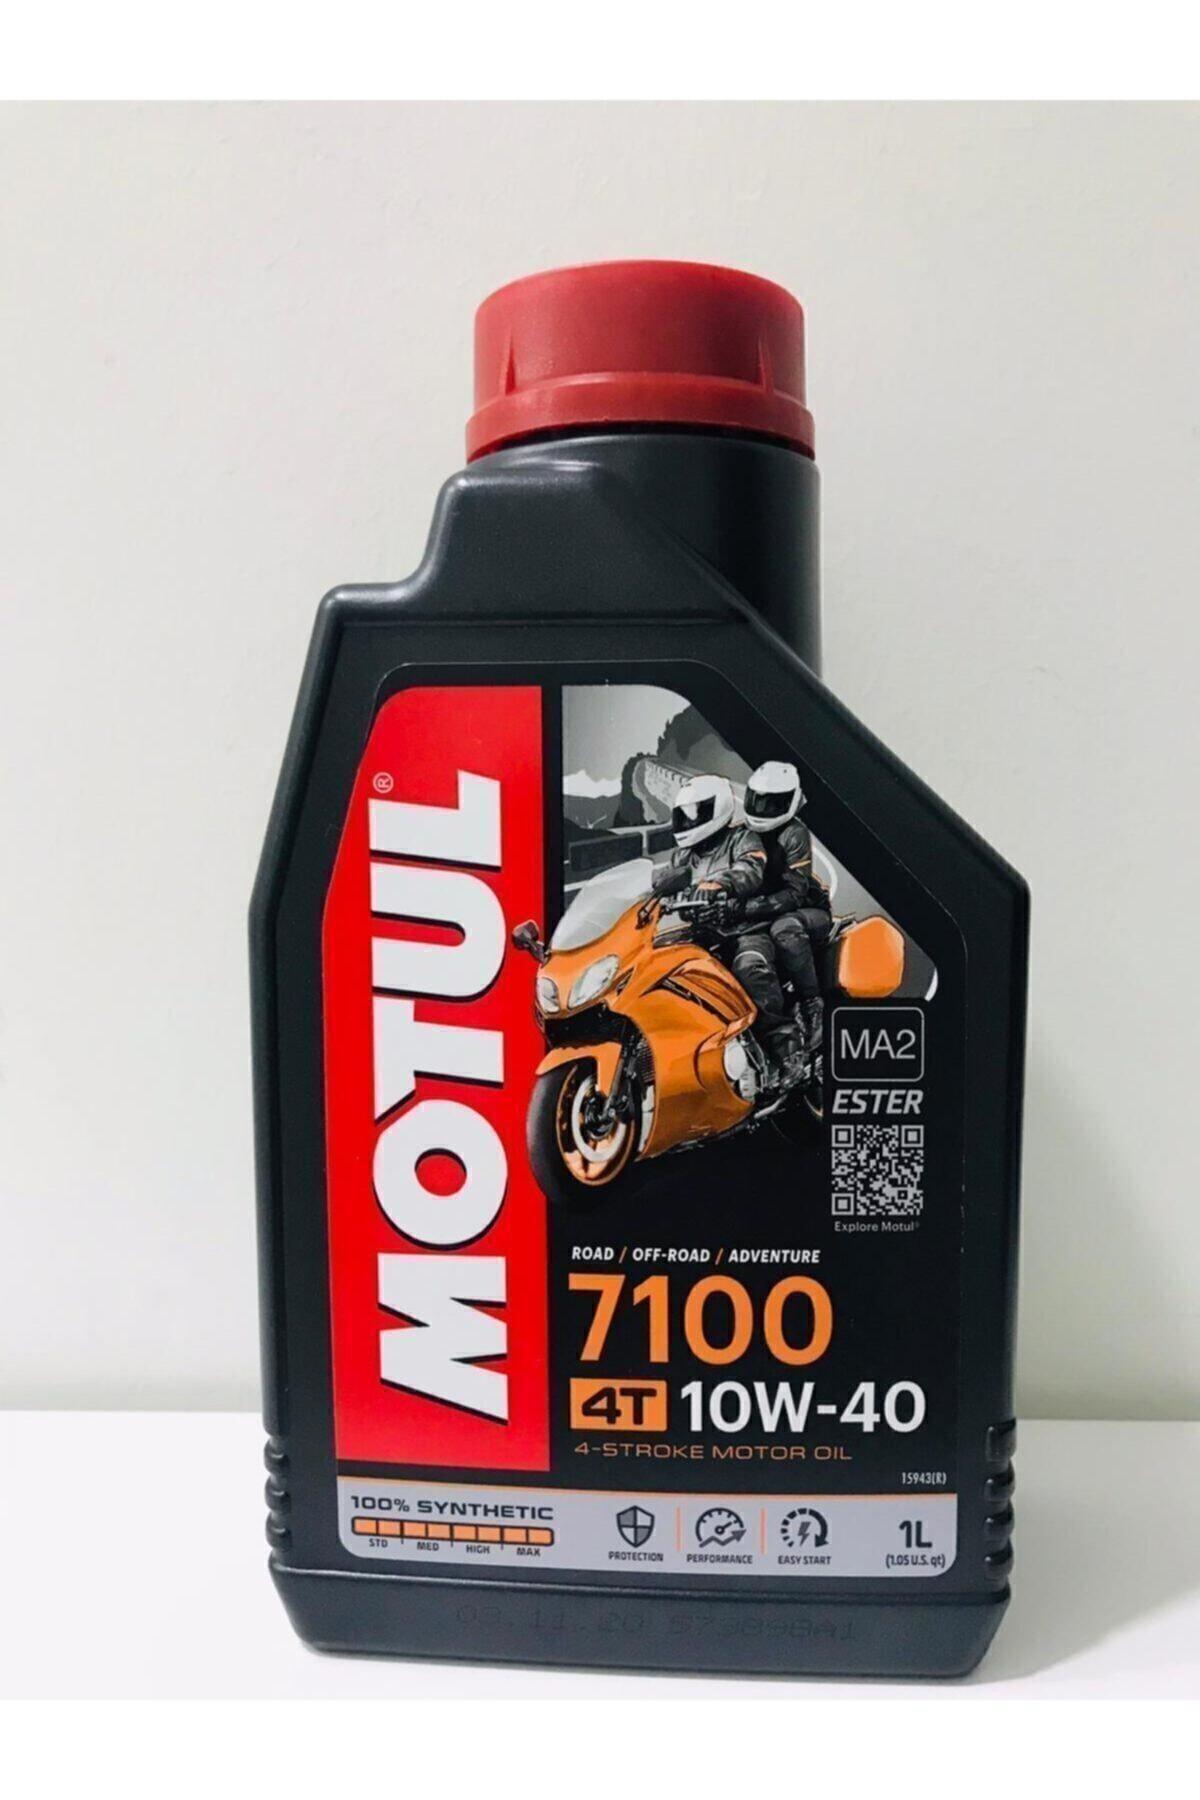 7100 10w40 4t 1 Litre Motosiklet Yağı